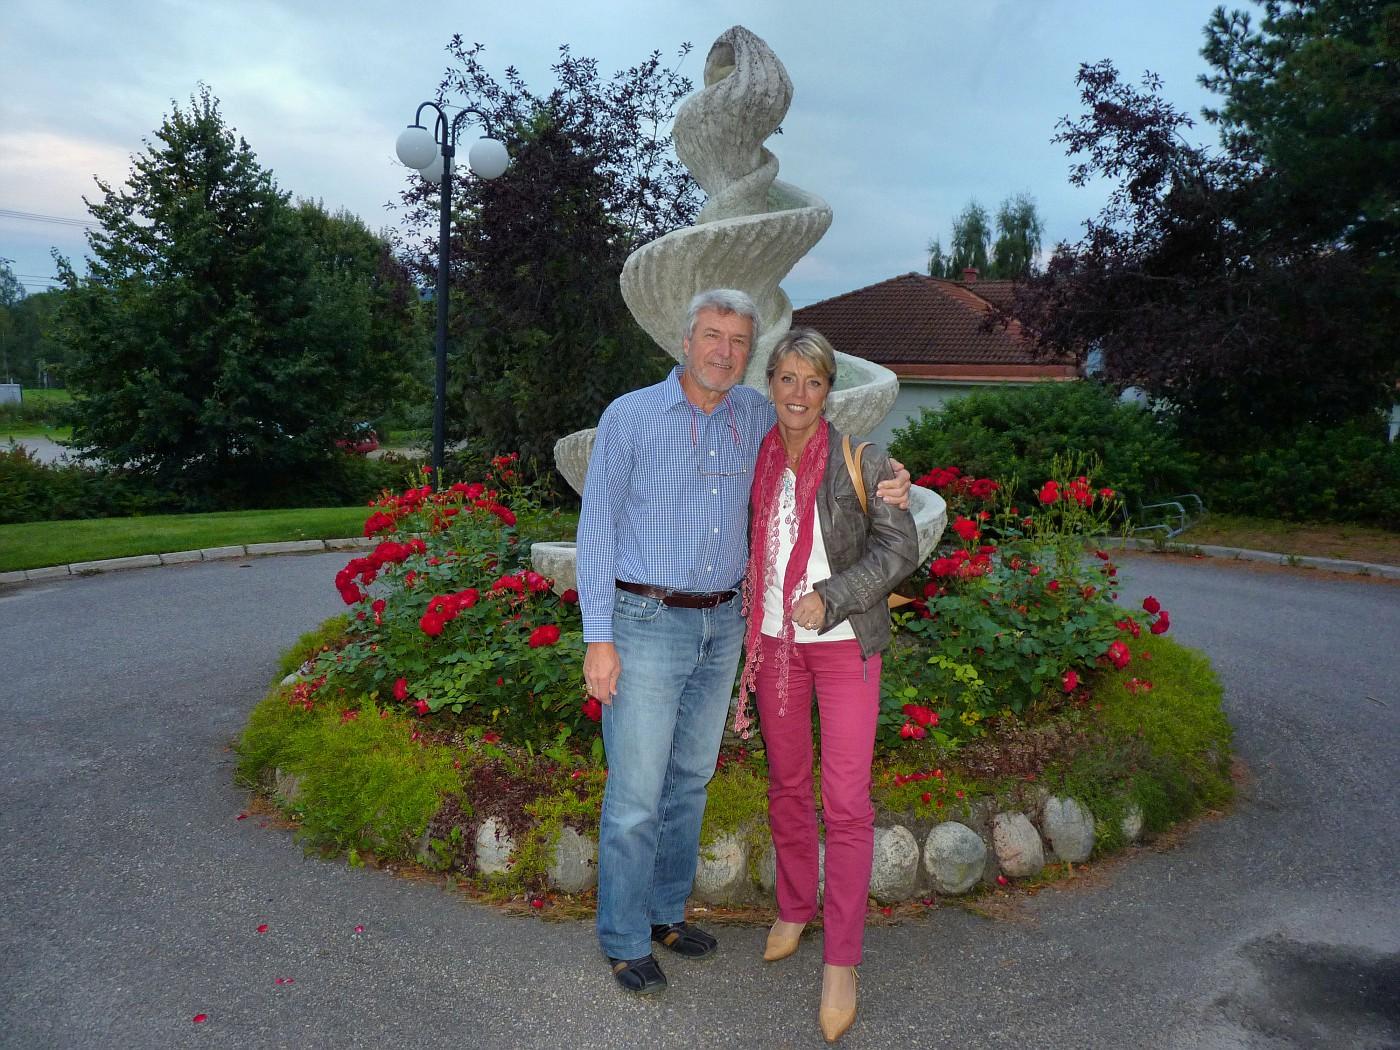 2011 08 21 24 Suzie and Carlos visit